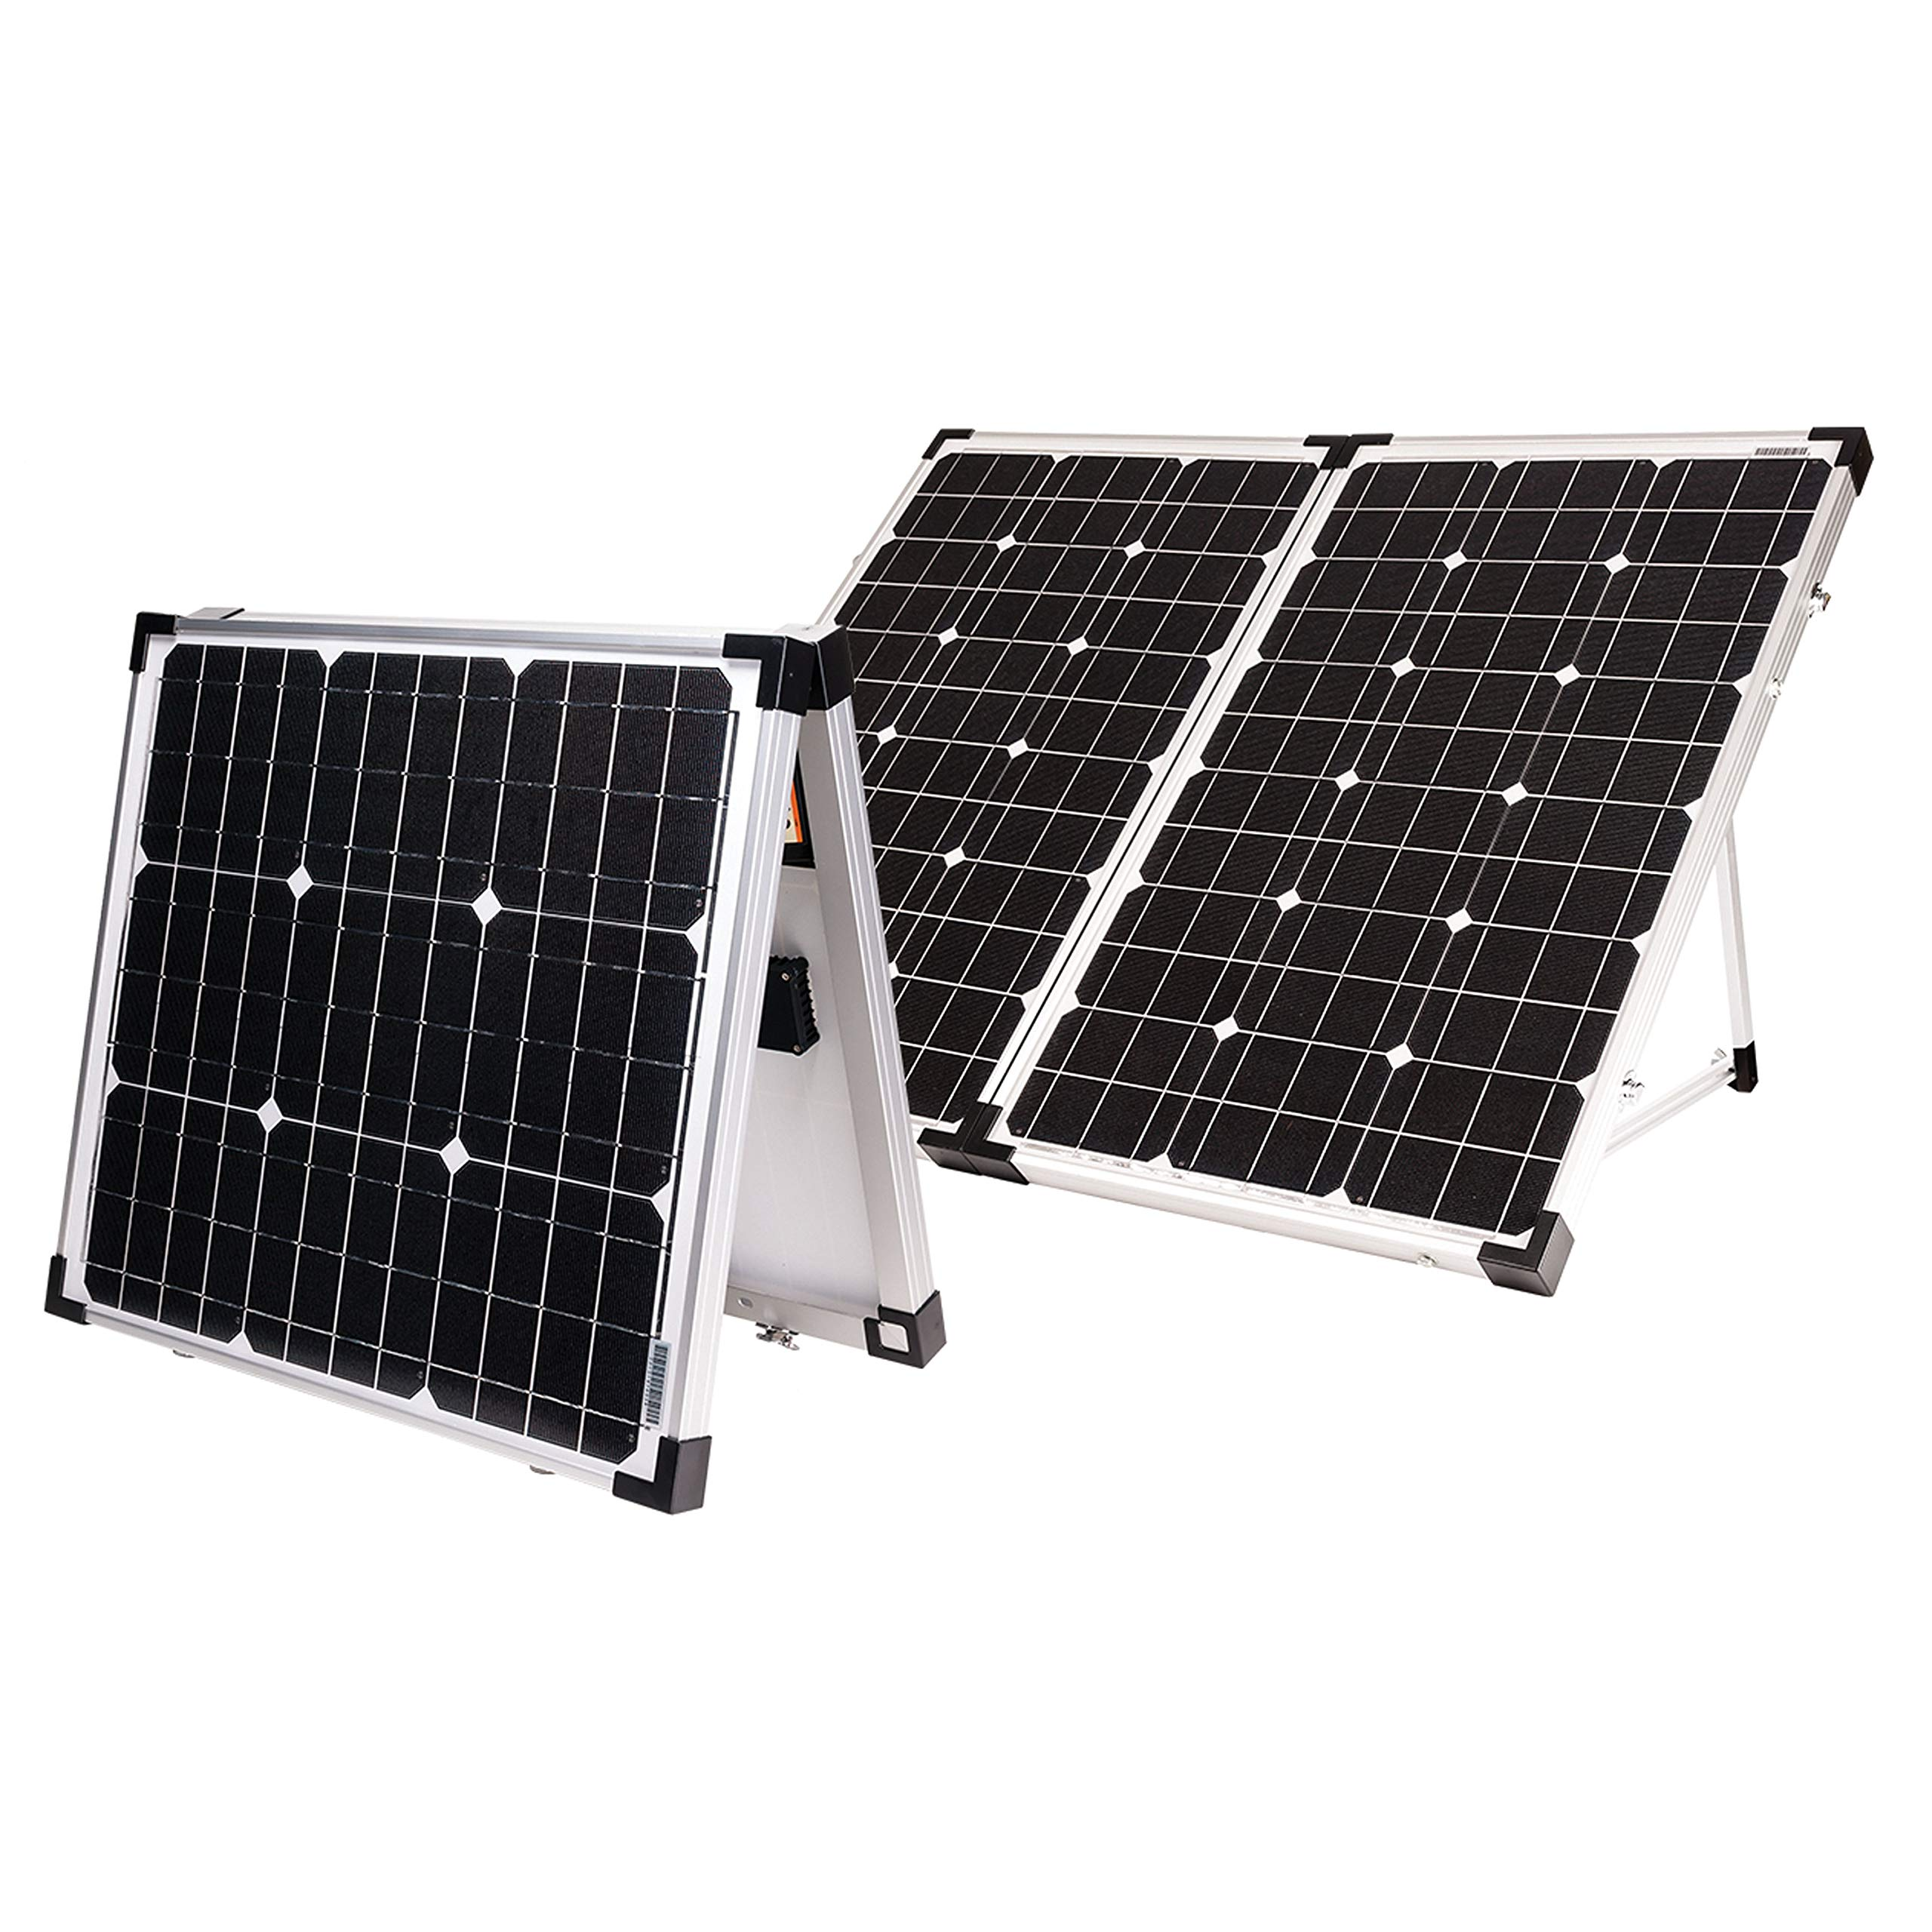 Go Power! Valterra Power Us, LLC GP-PSK-120 Solar Kit 120W Portable